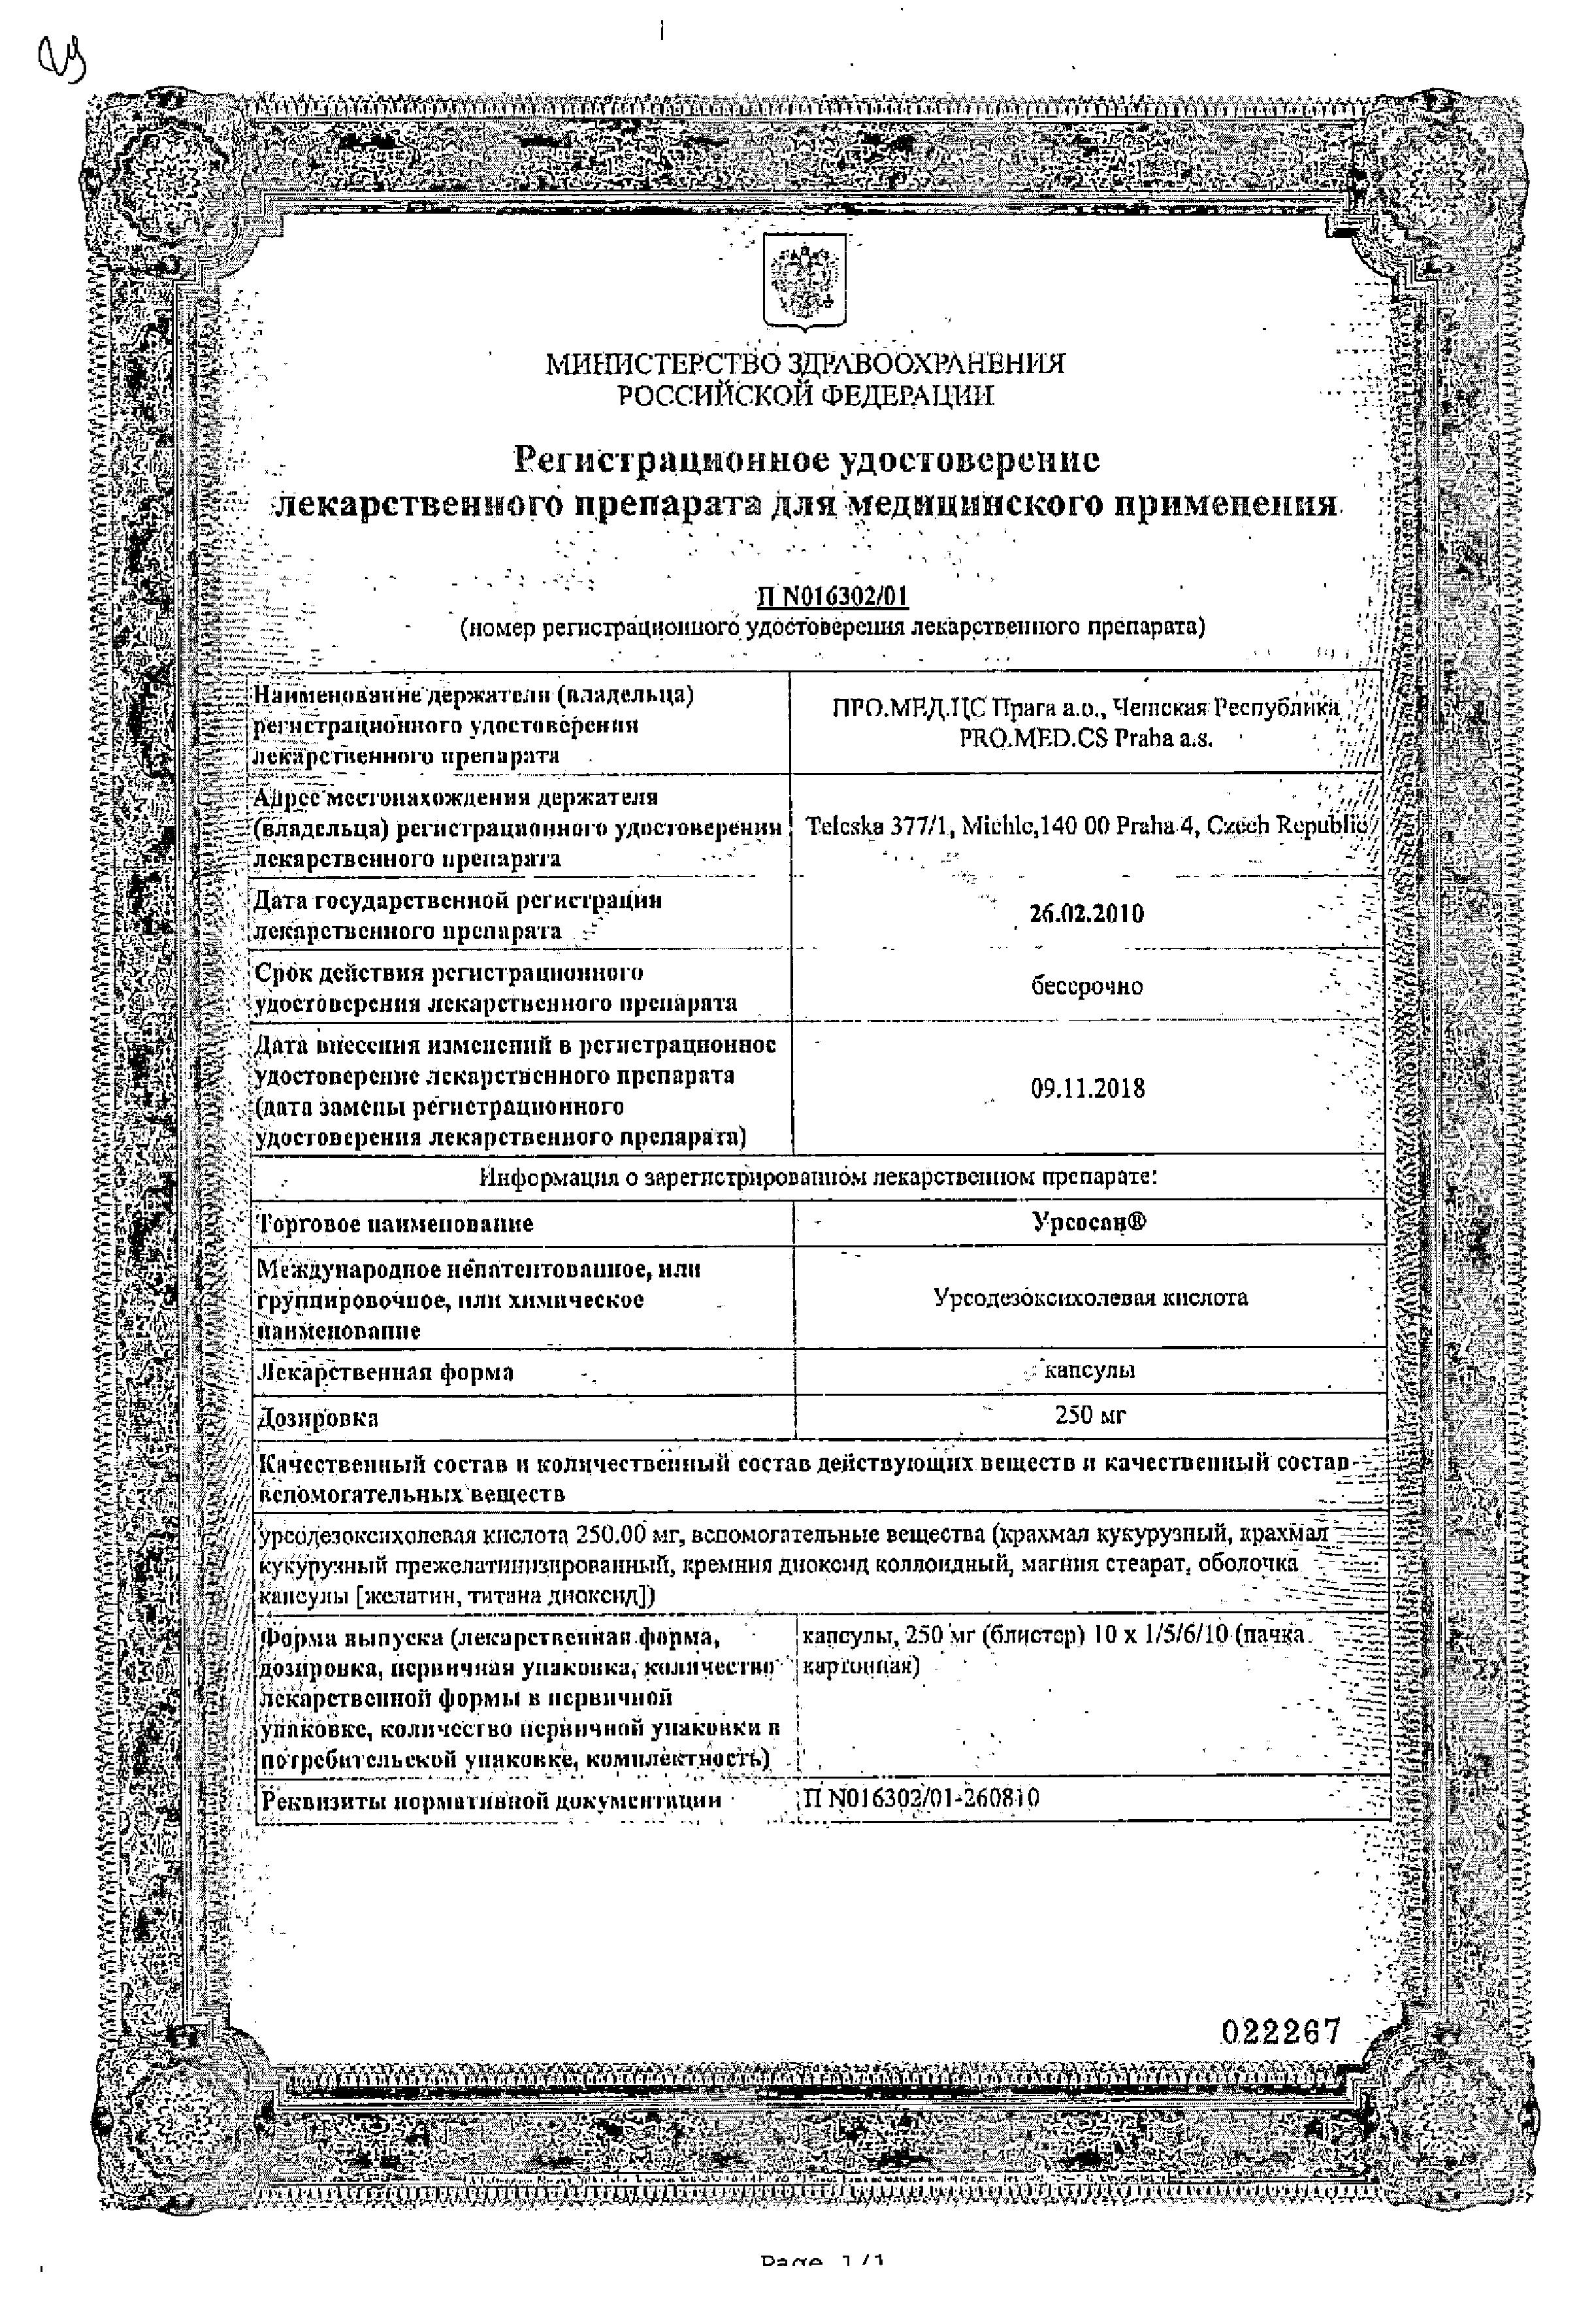 Урсосан сертификат